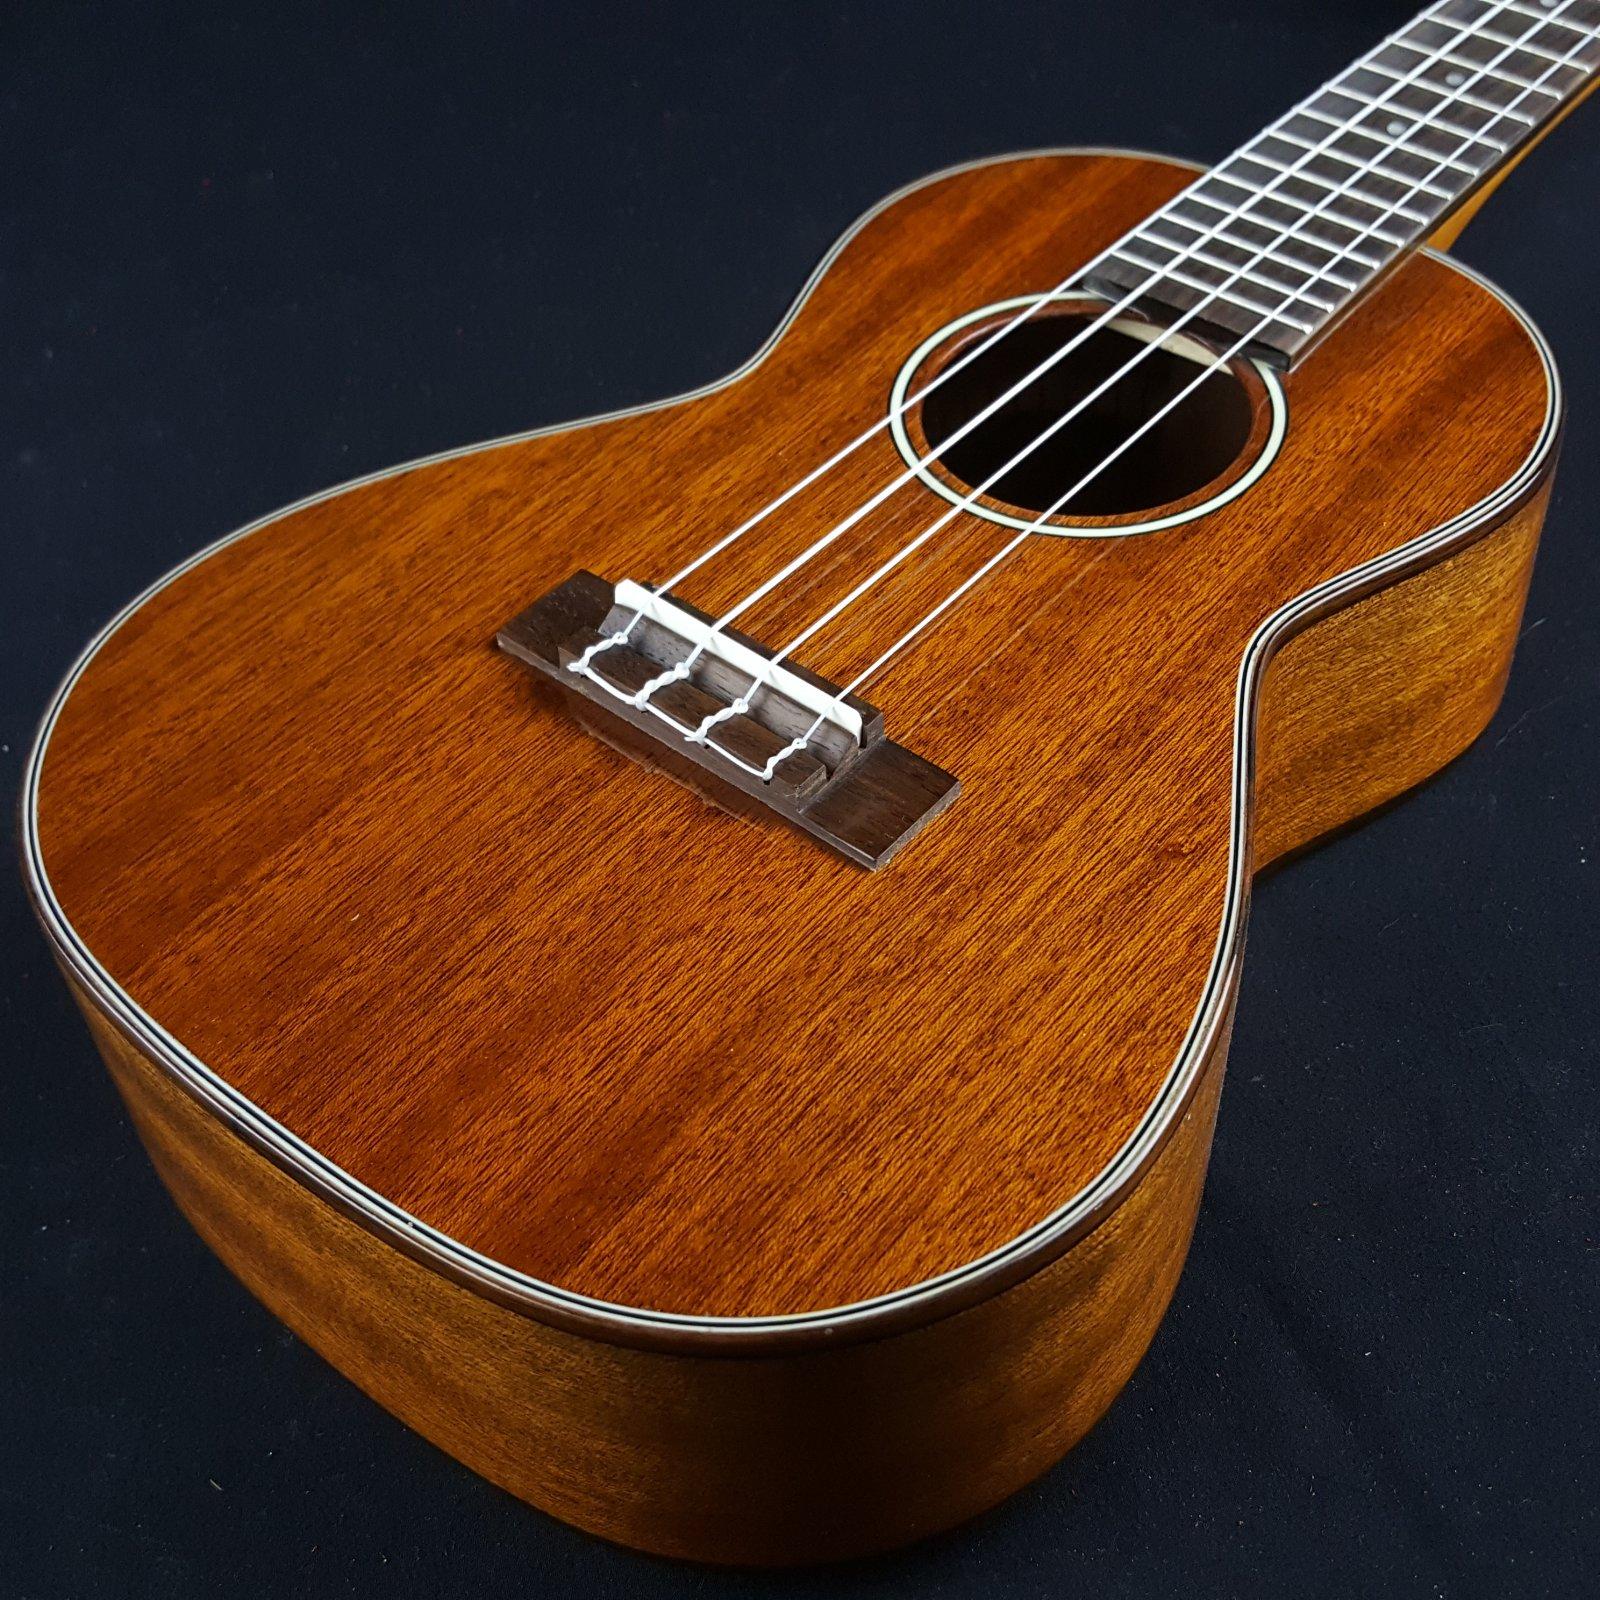 Ohana CK-35G All Solid Mahogany Concert ukulele